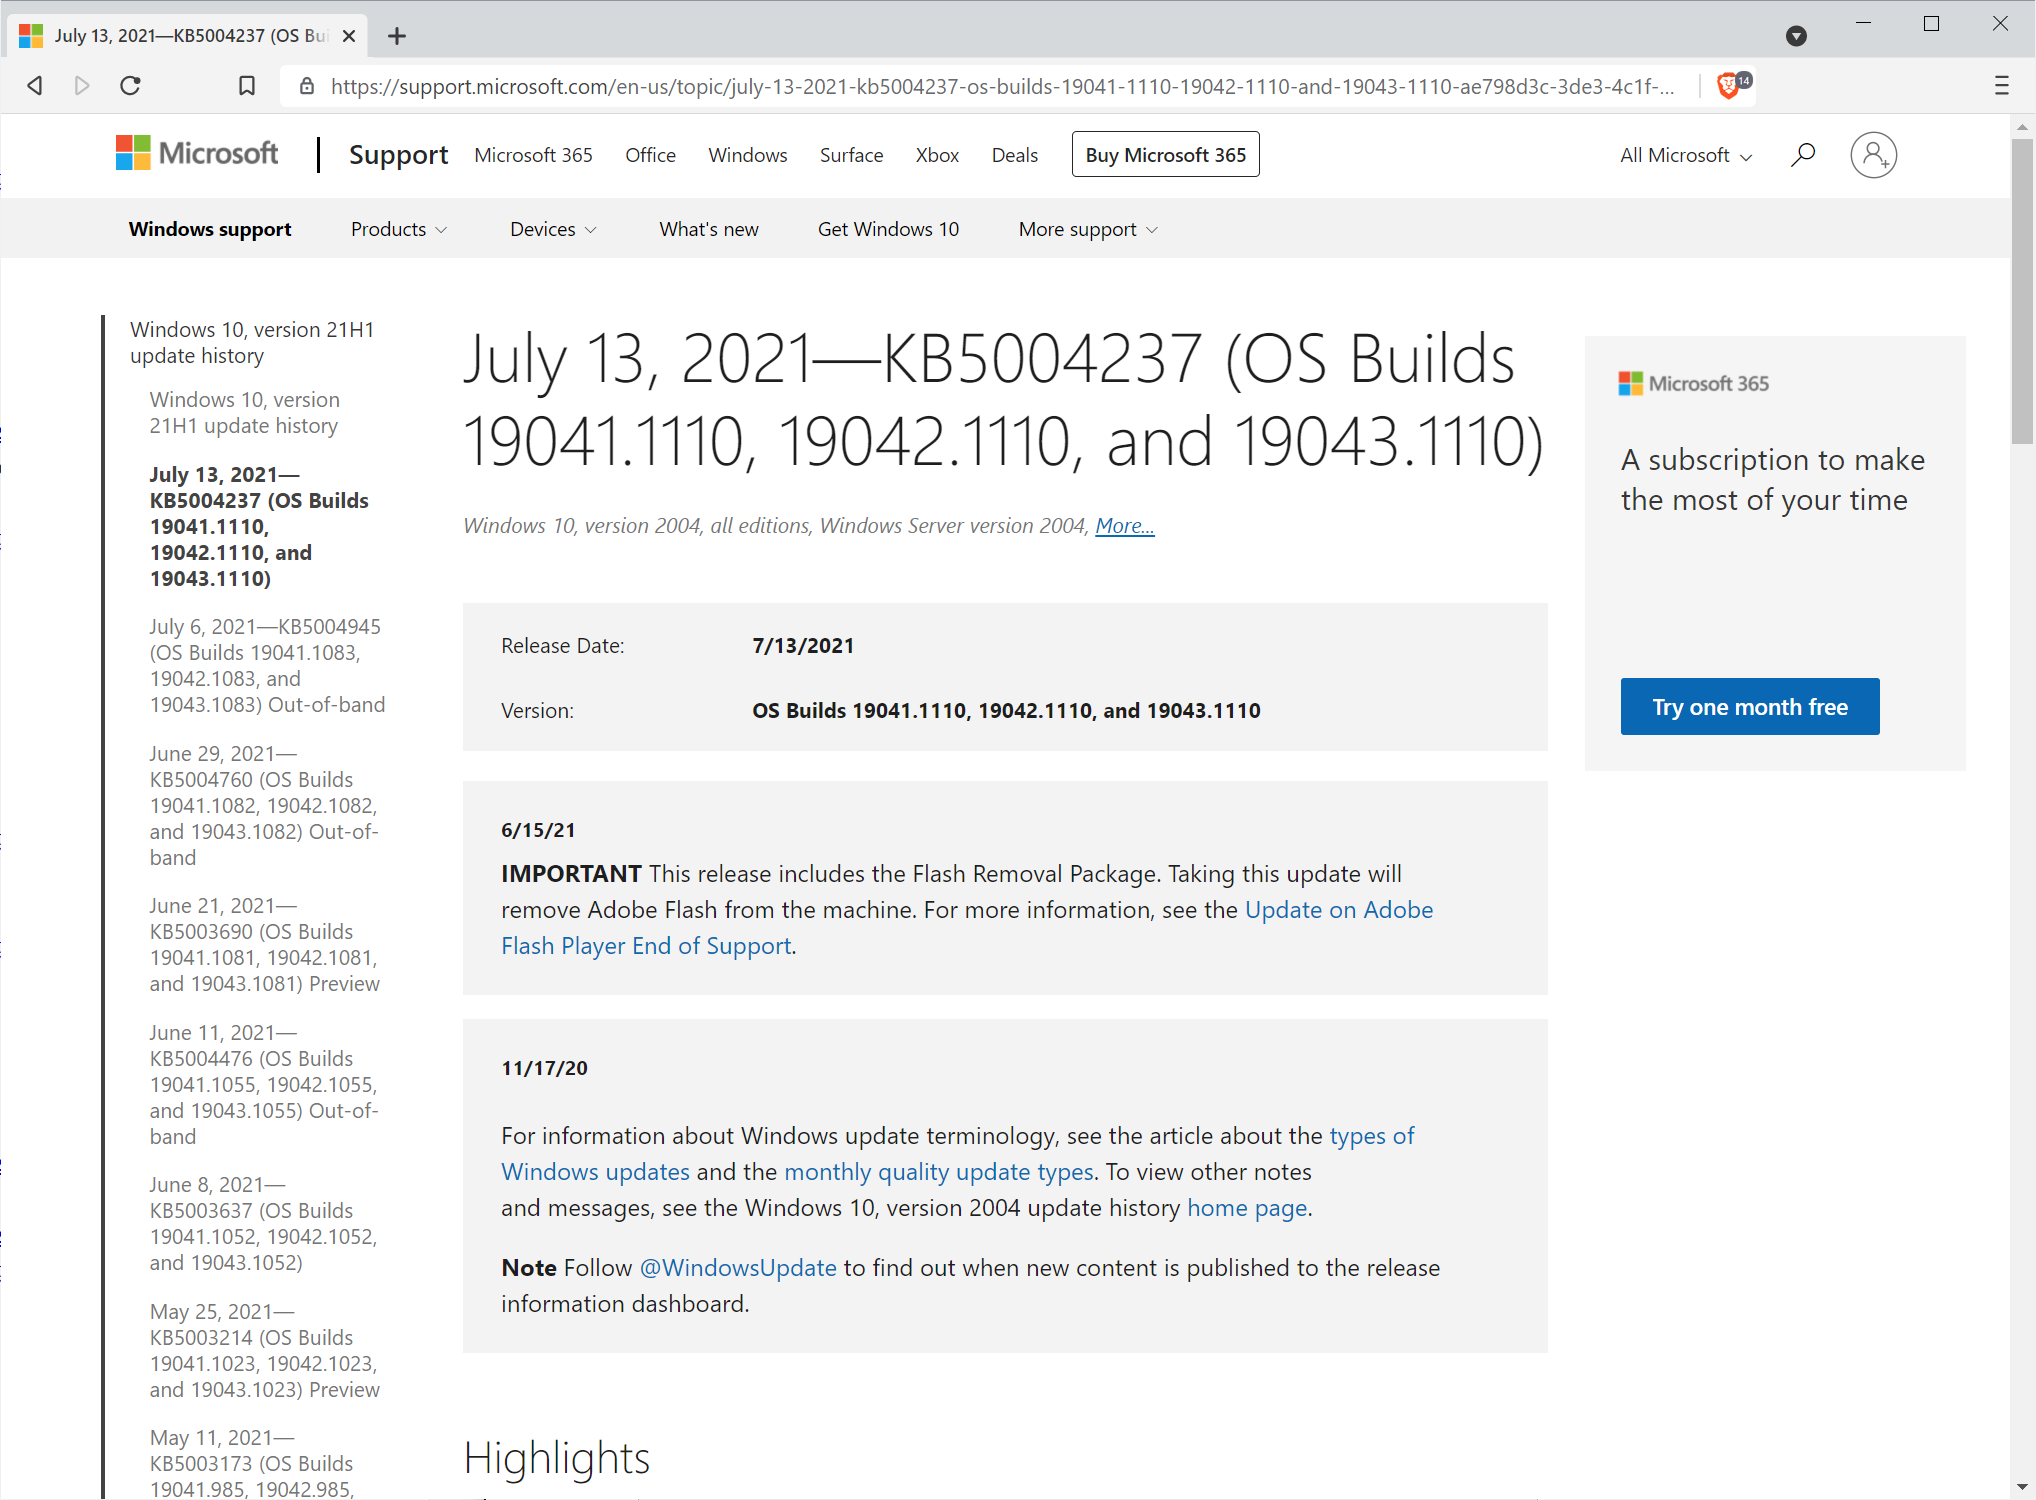 microsoft-windows-பாதுகாப்பு-புதுப்பிப்புகள்-ஜூலை -2021